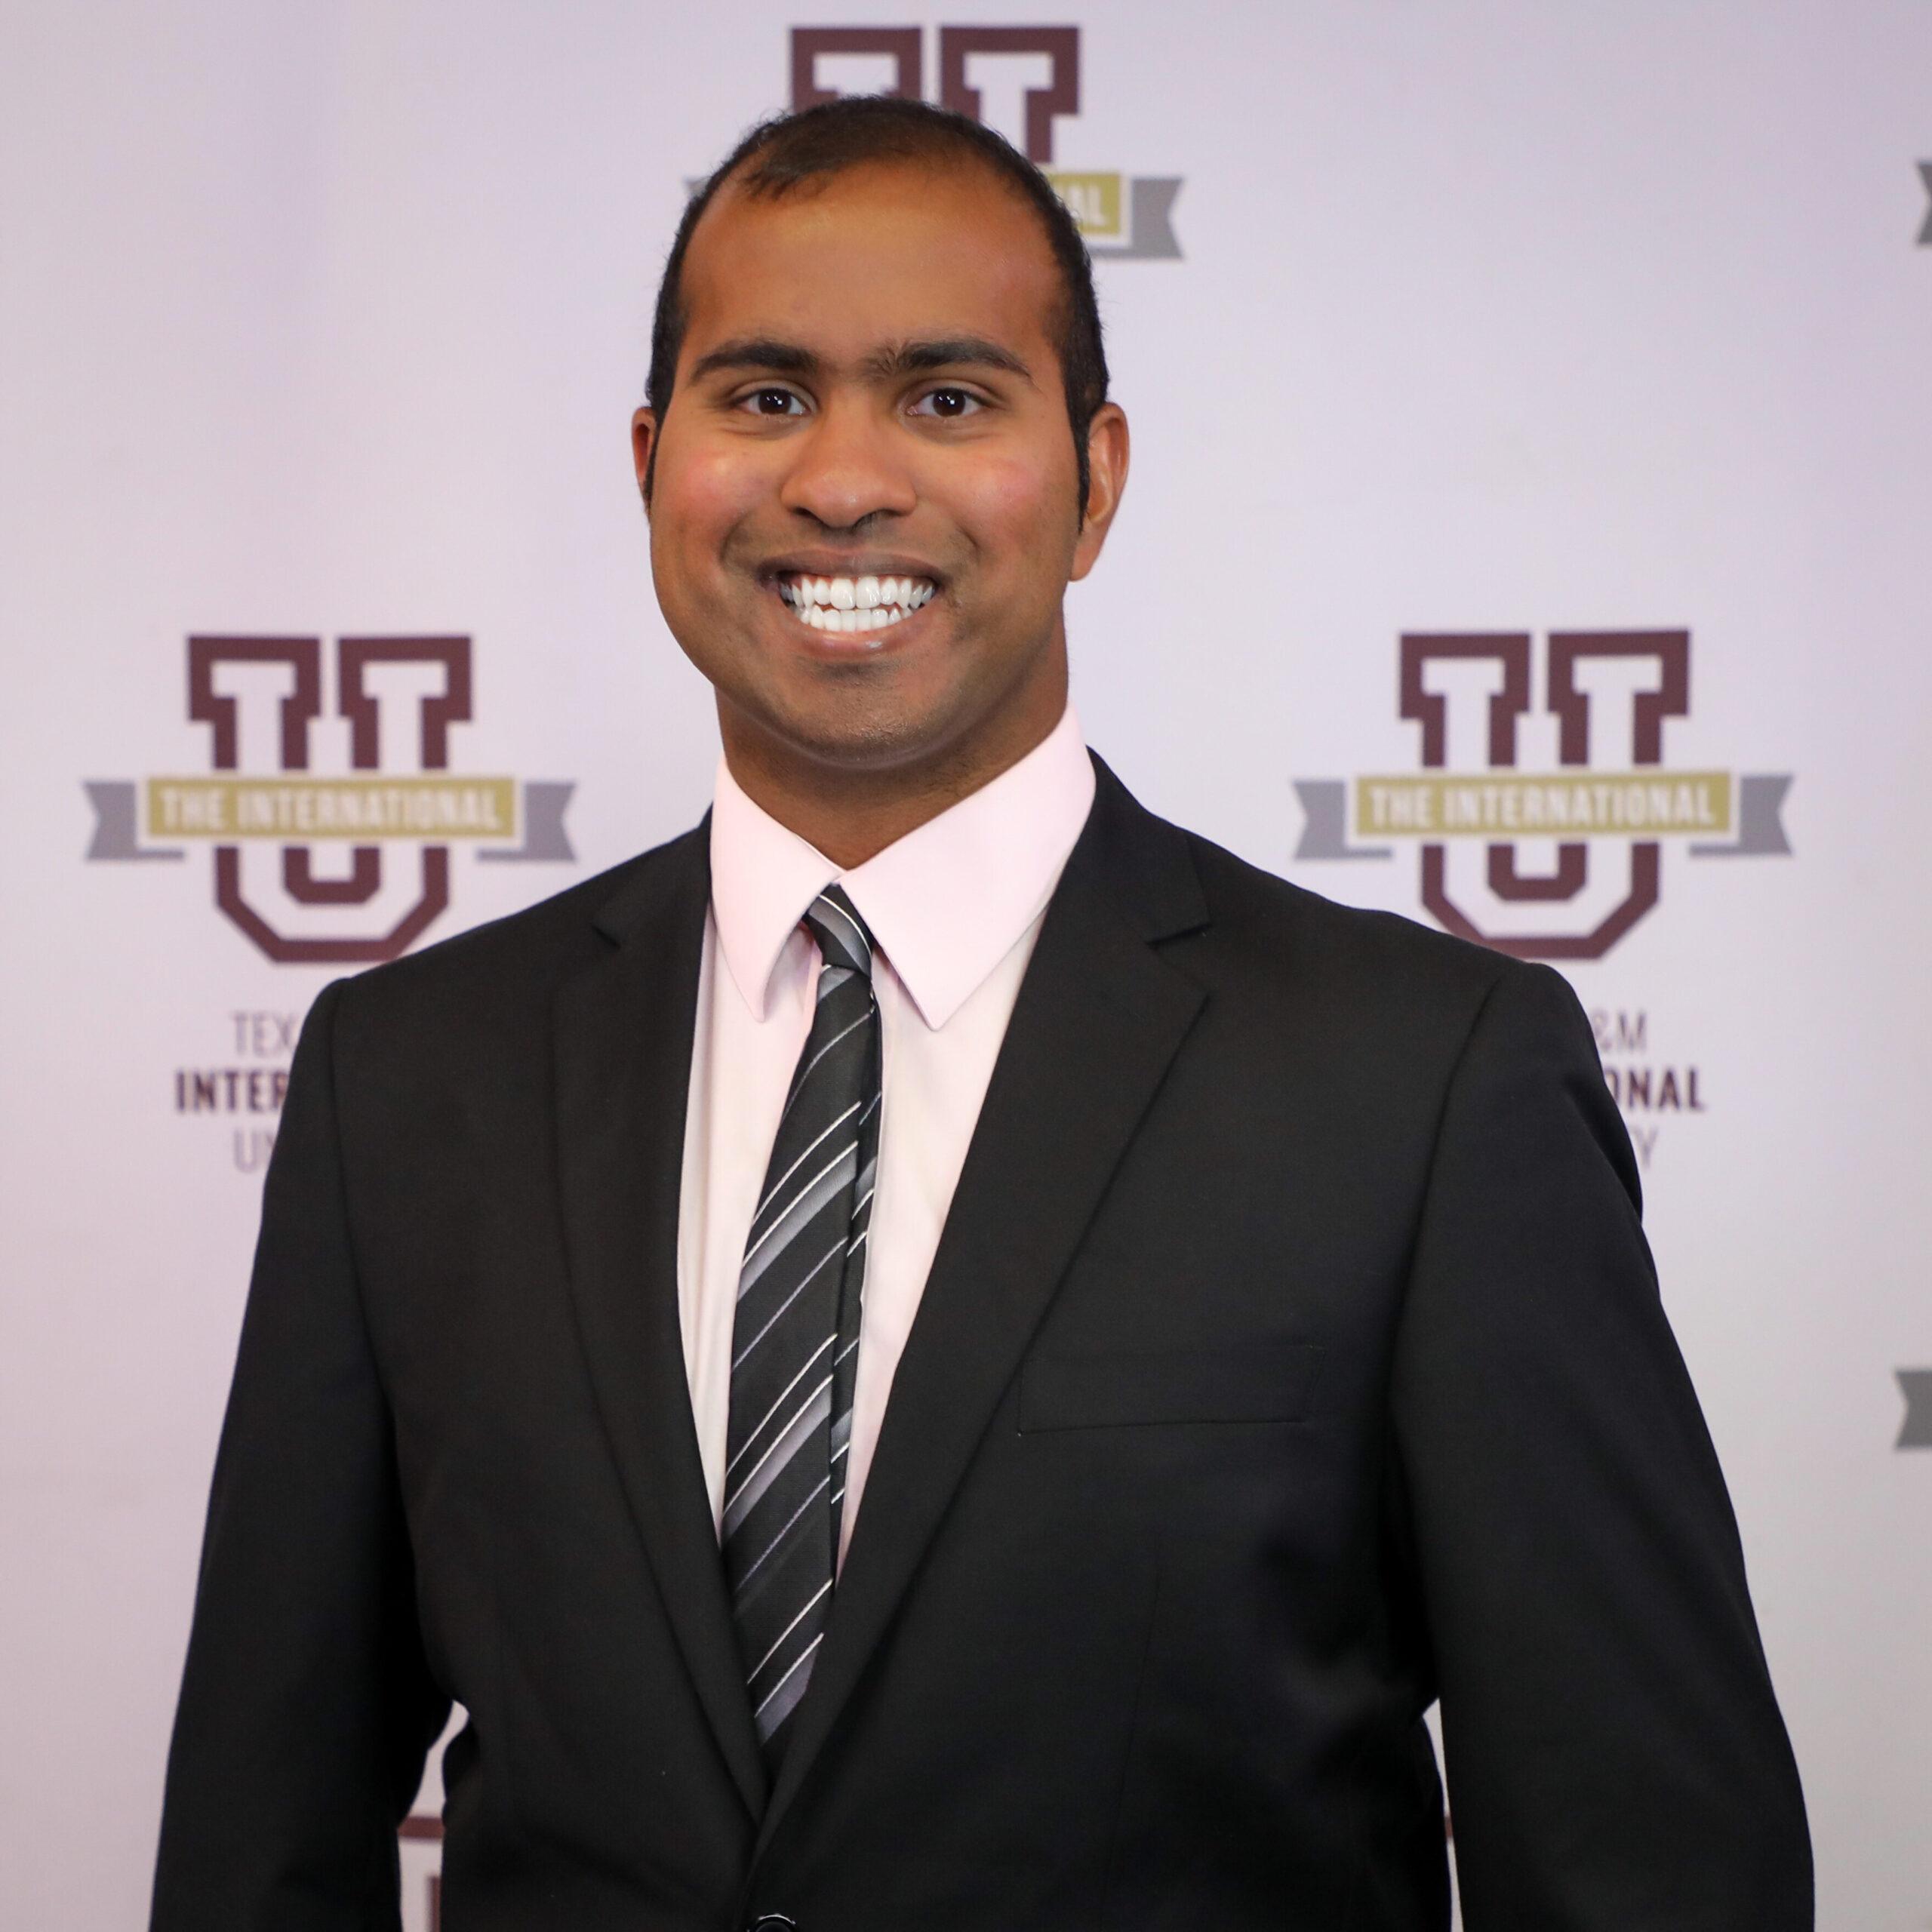 Jared Dmello, JMVR Editorial Board Member